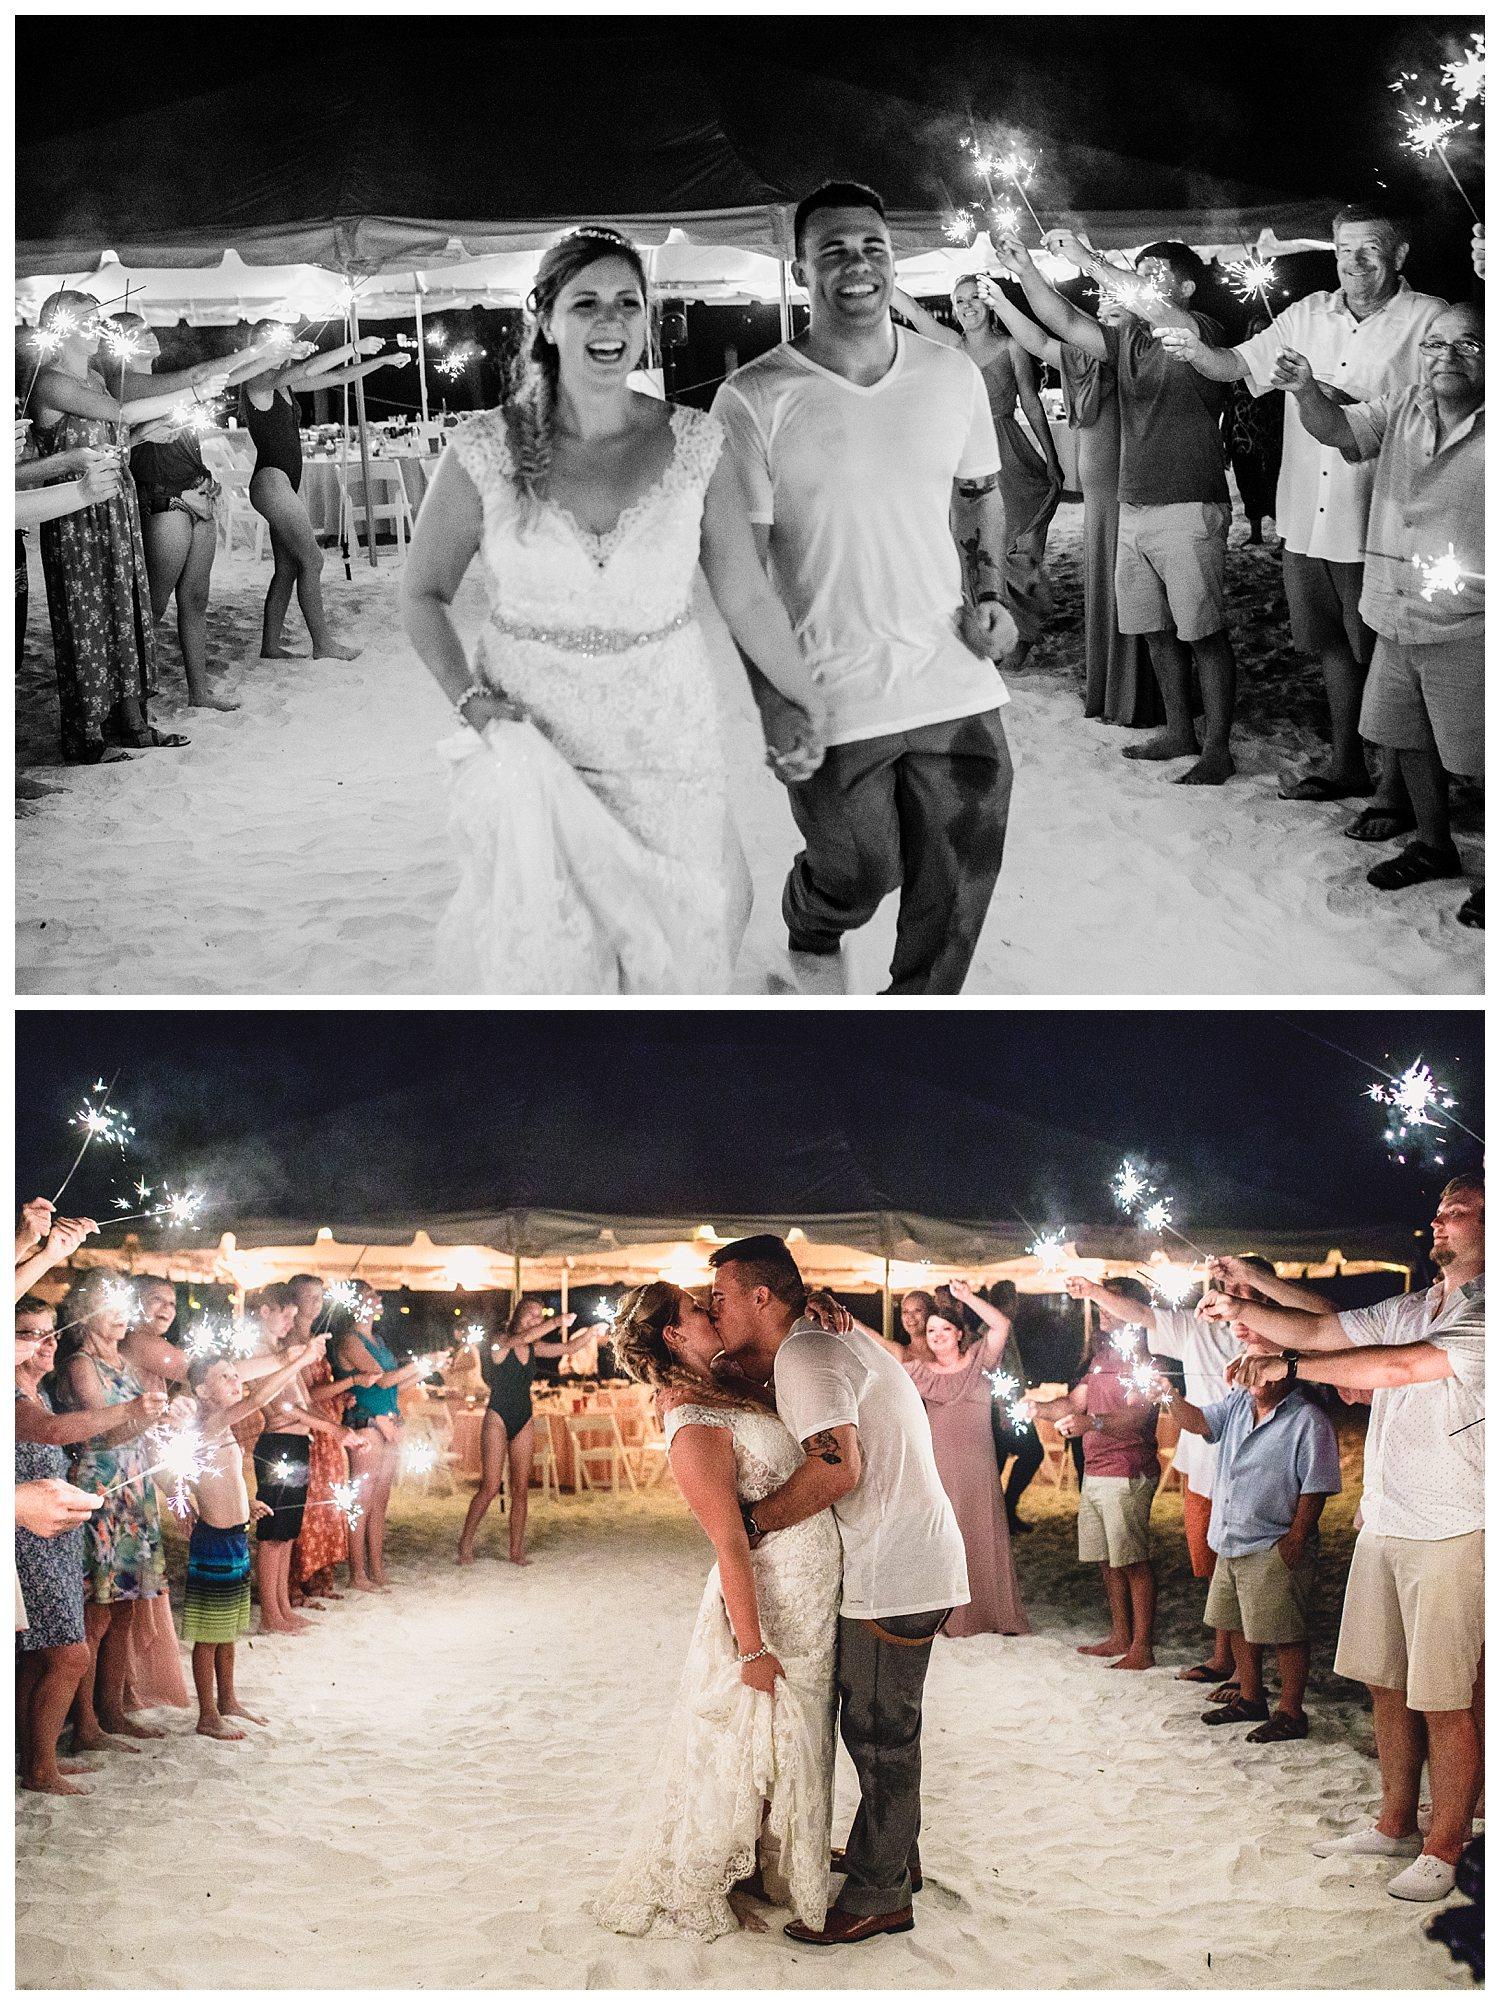 Kelsey_Diane_Photography_Destination_Wedding_Sarasota_Florida_Beach_Wedding_Alex_Austin_0695.jpg